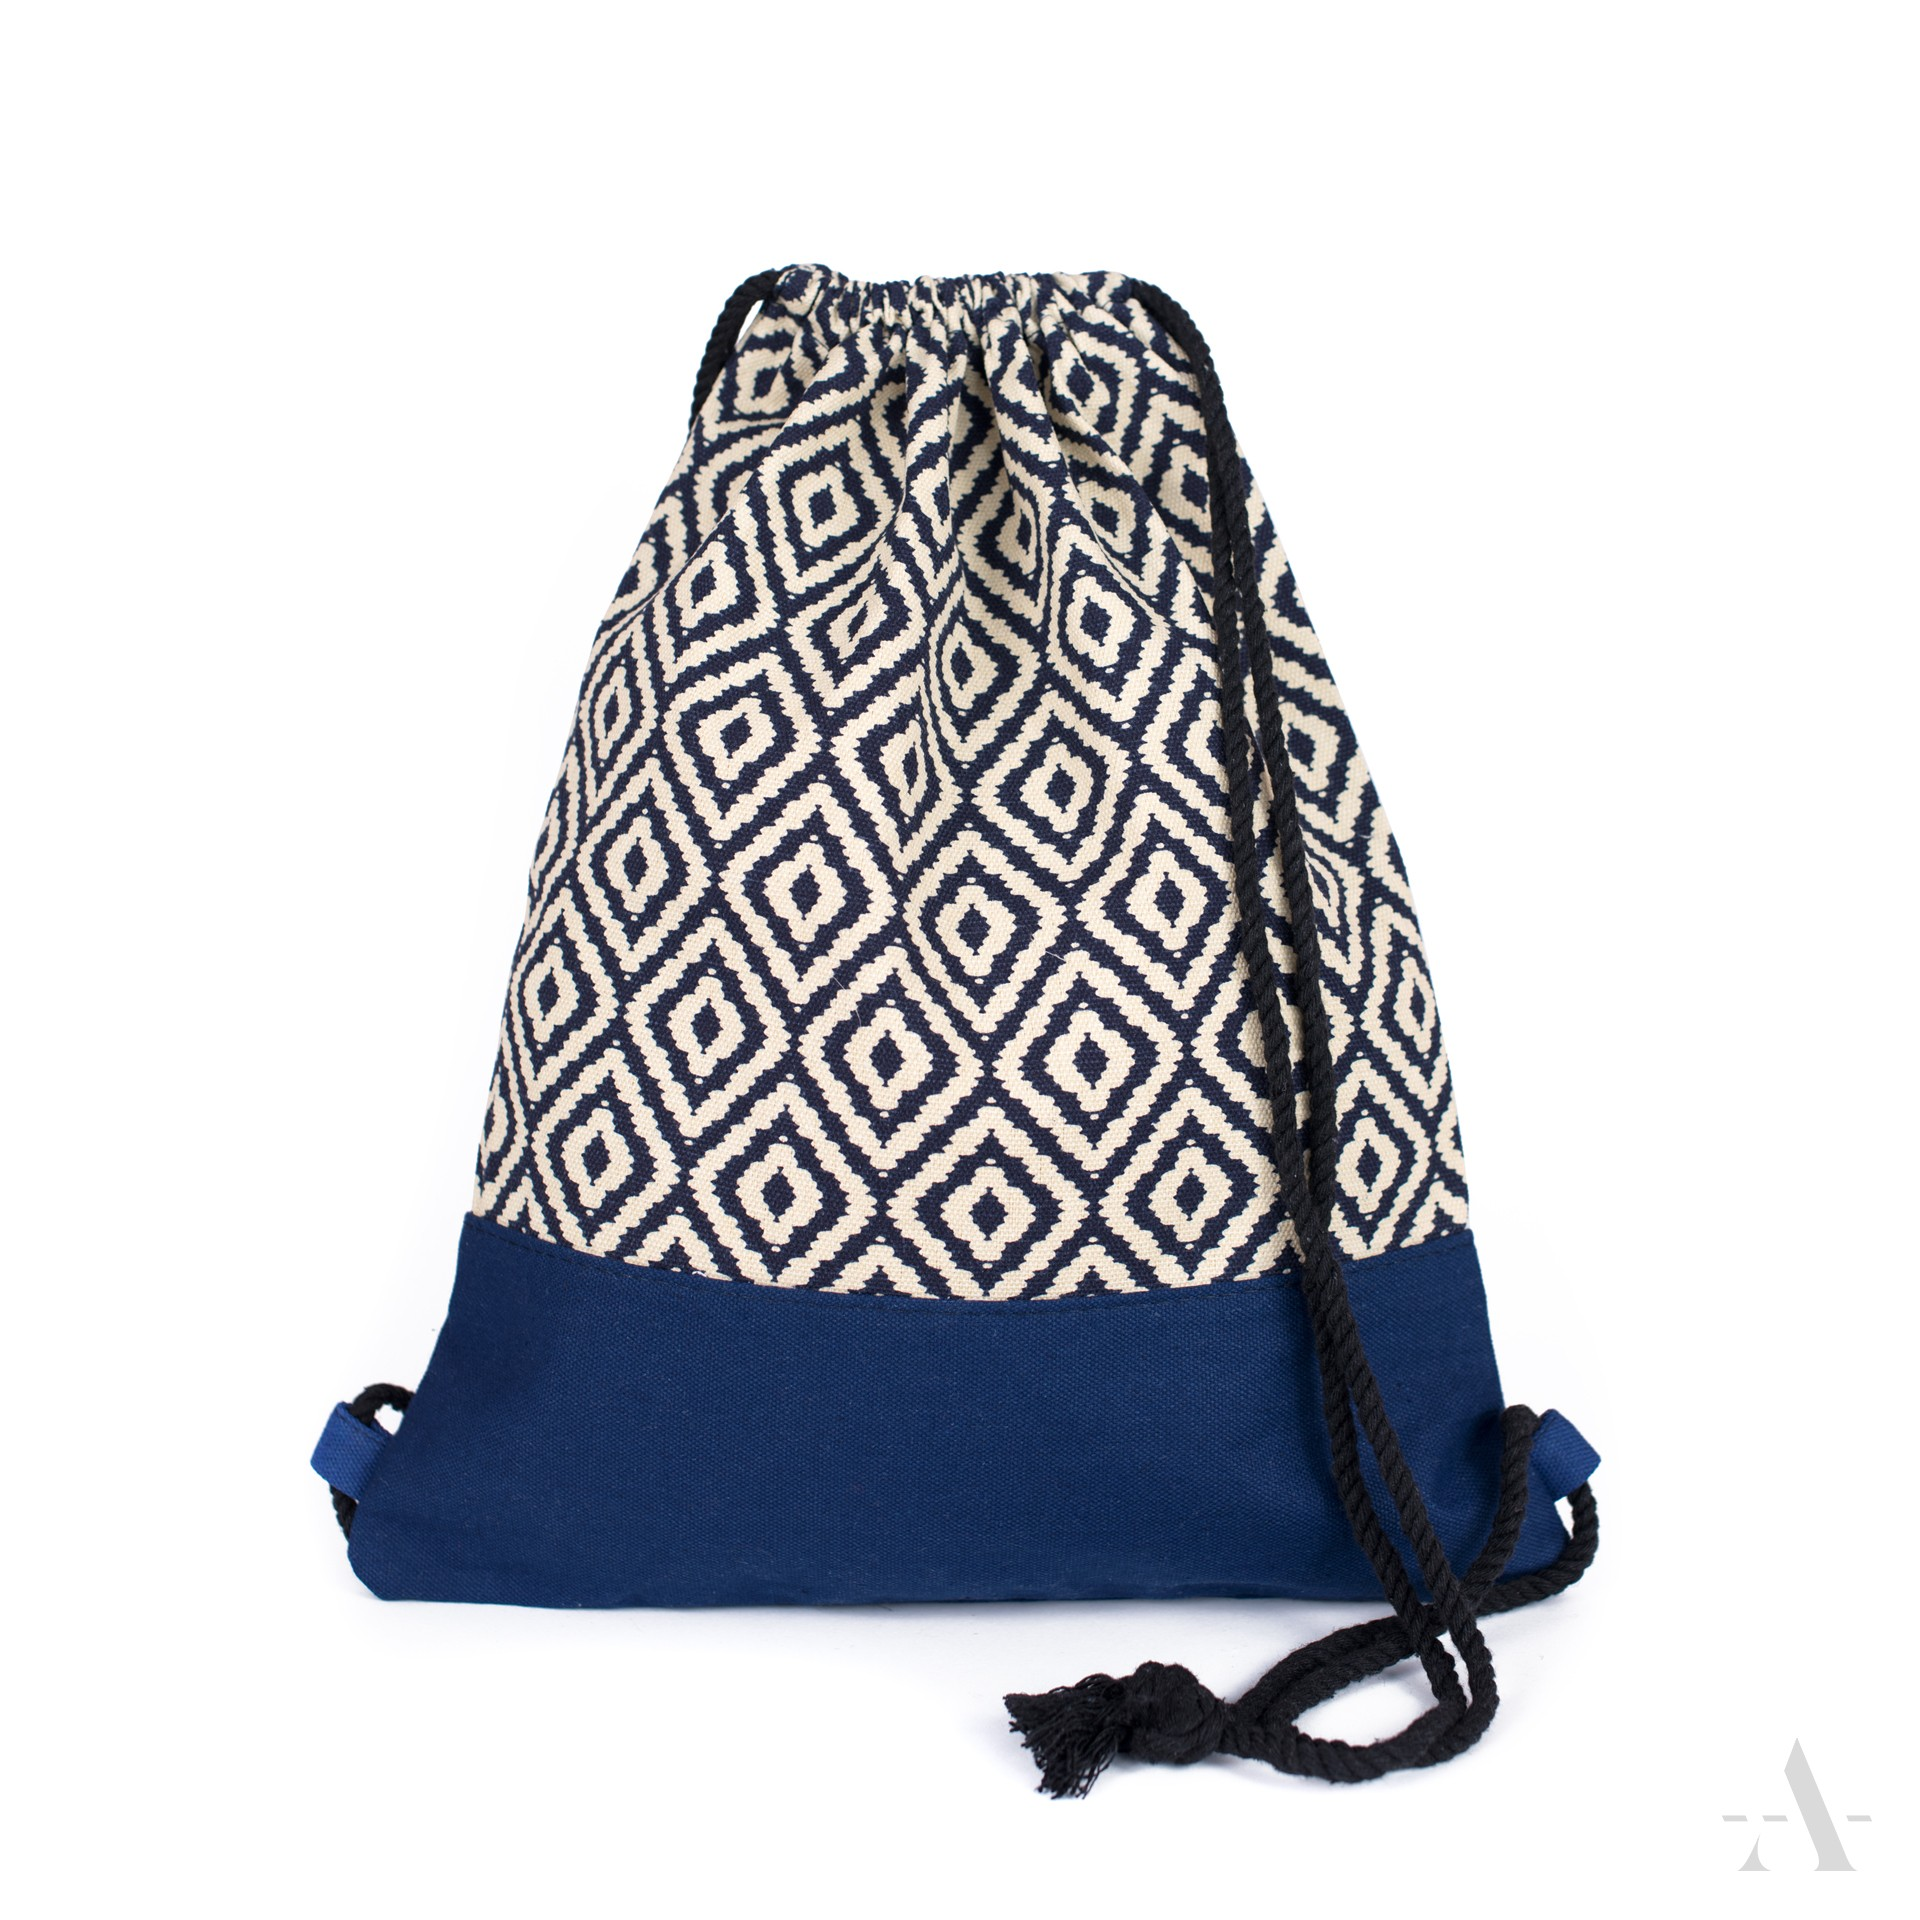 a4610babdca77 Plecak ADVENTURE 7 Art of Polo- sklep internetowy E-lady.pl